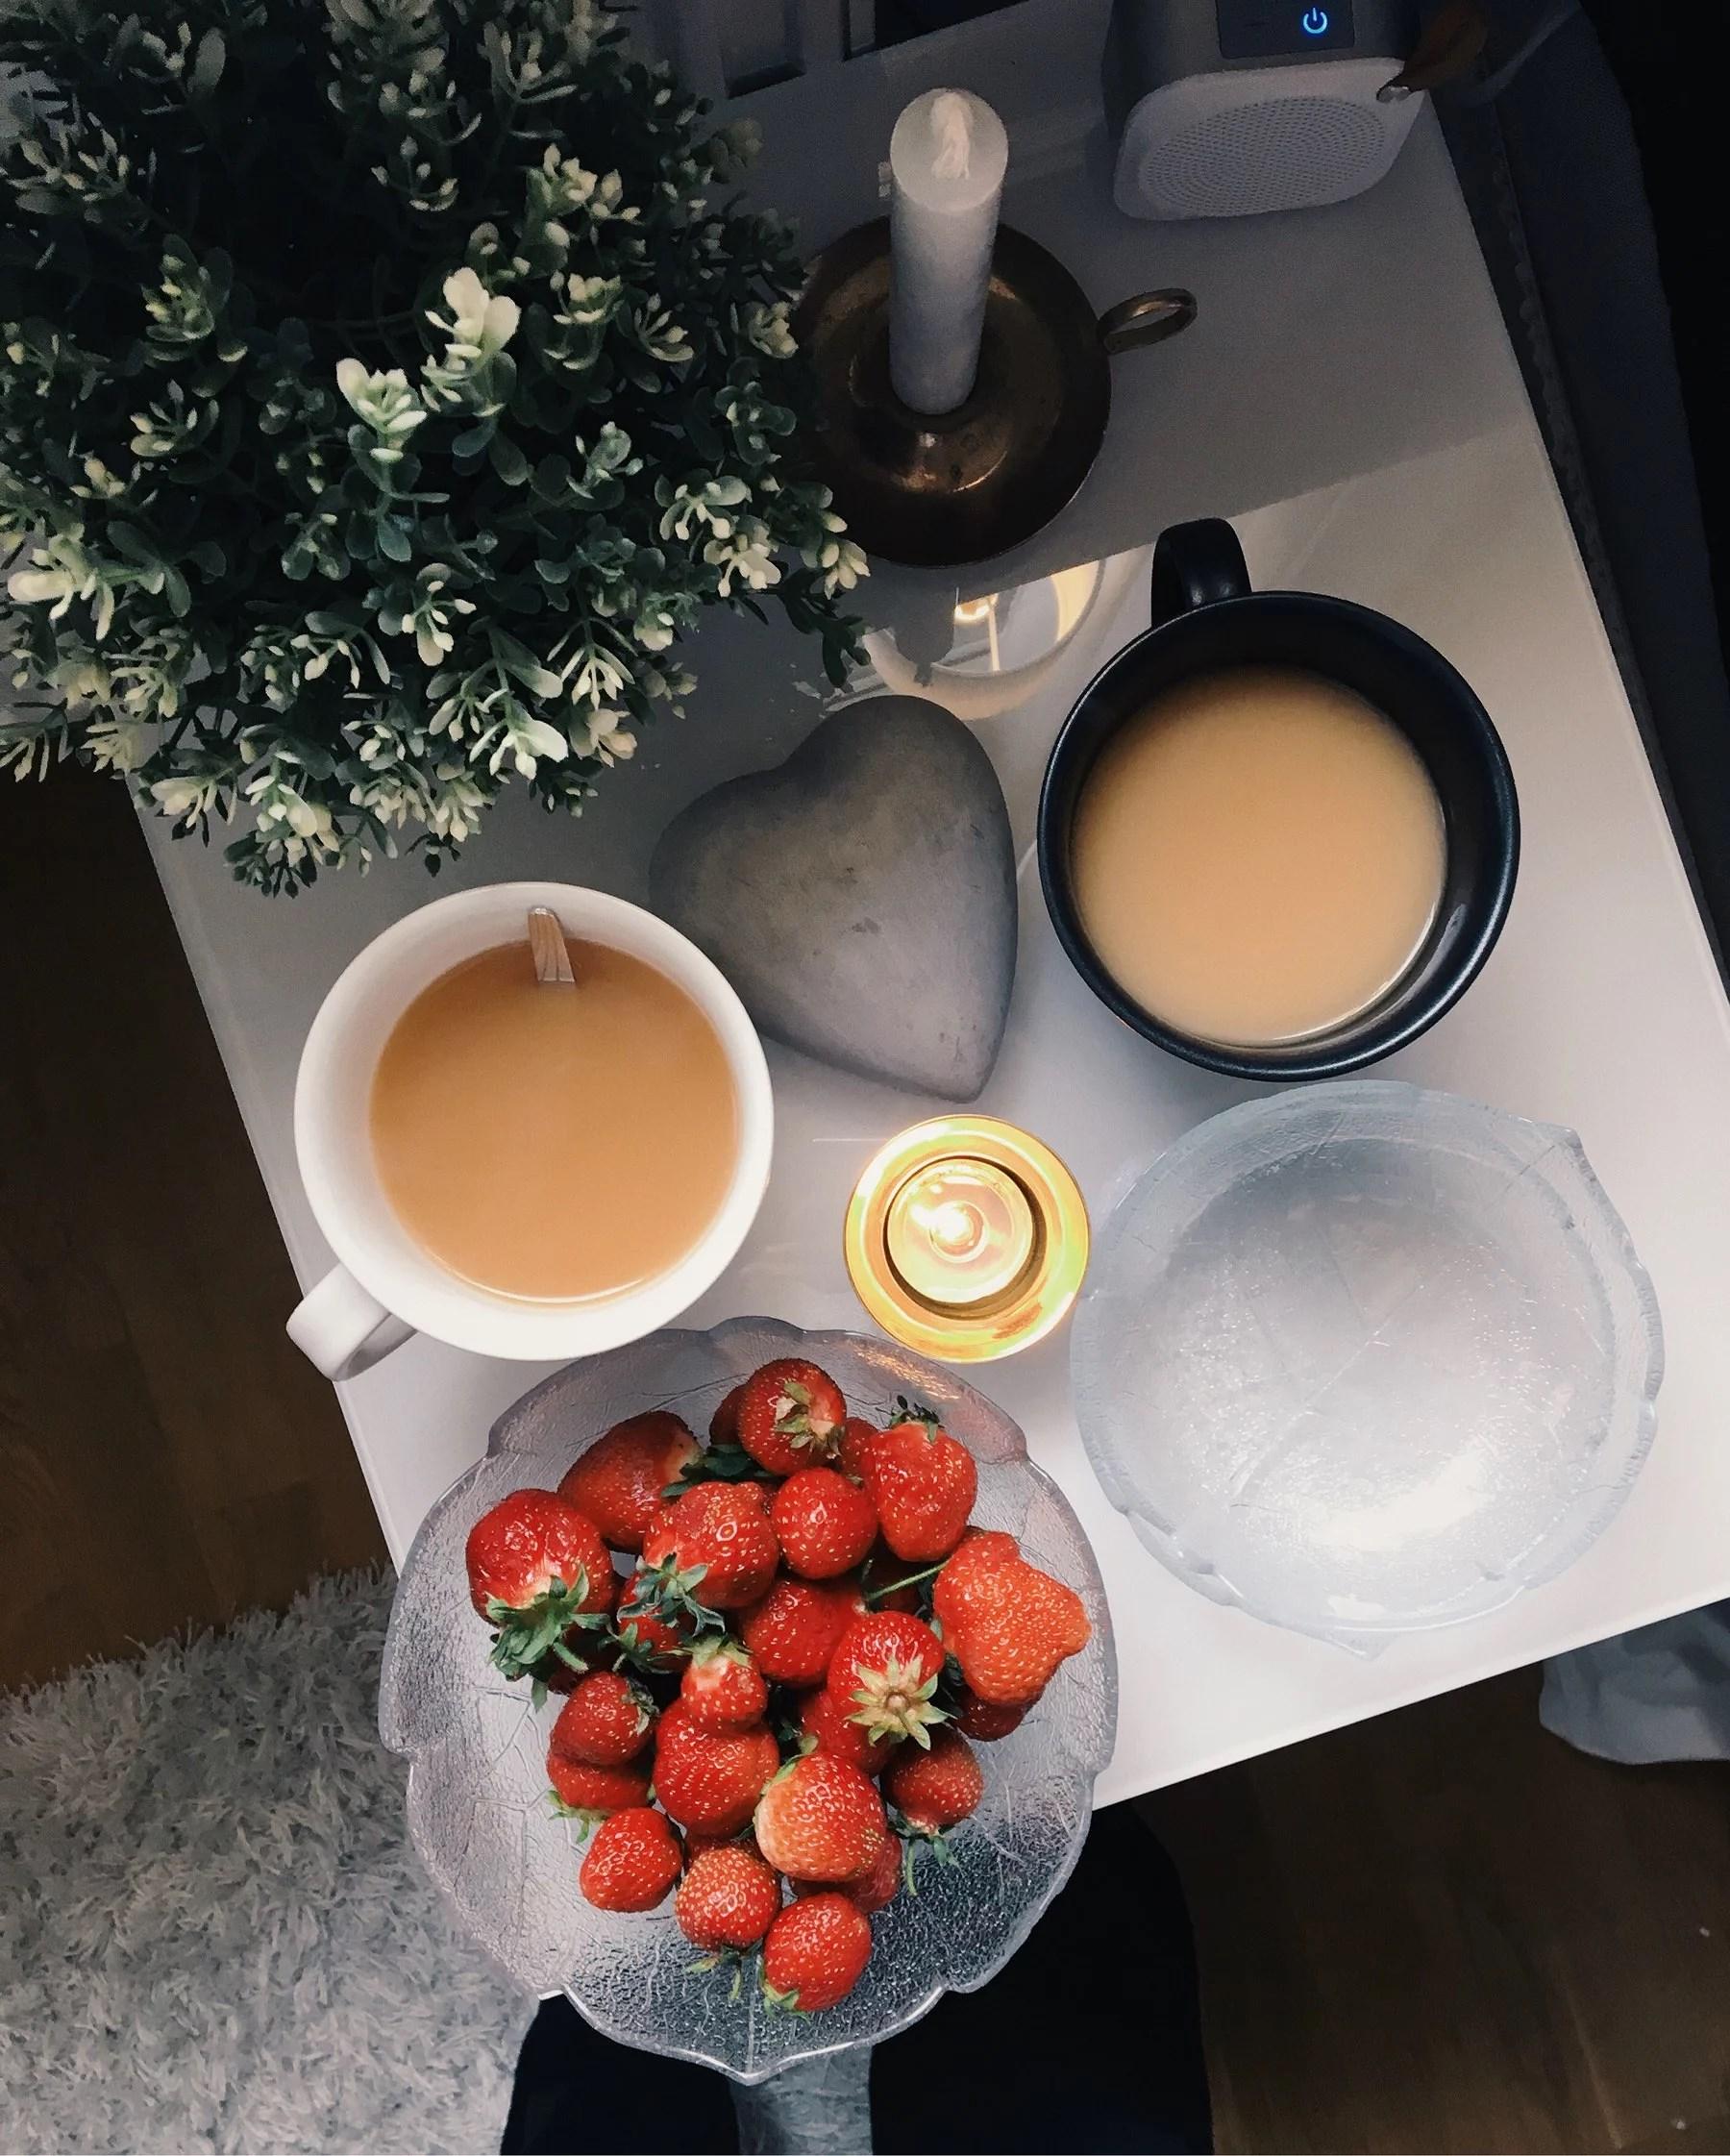 When life gives you rain make some Tea